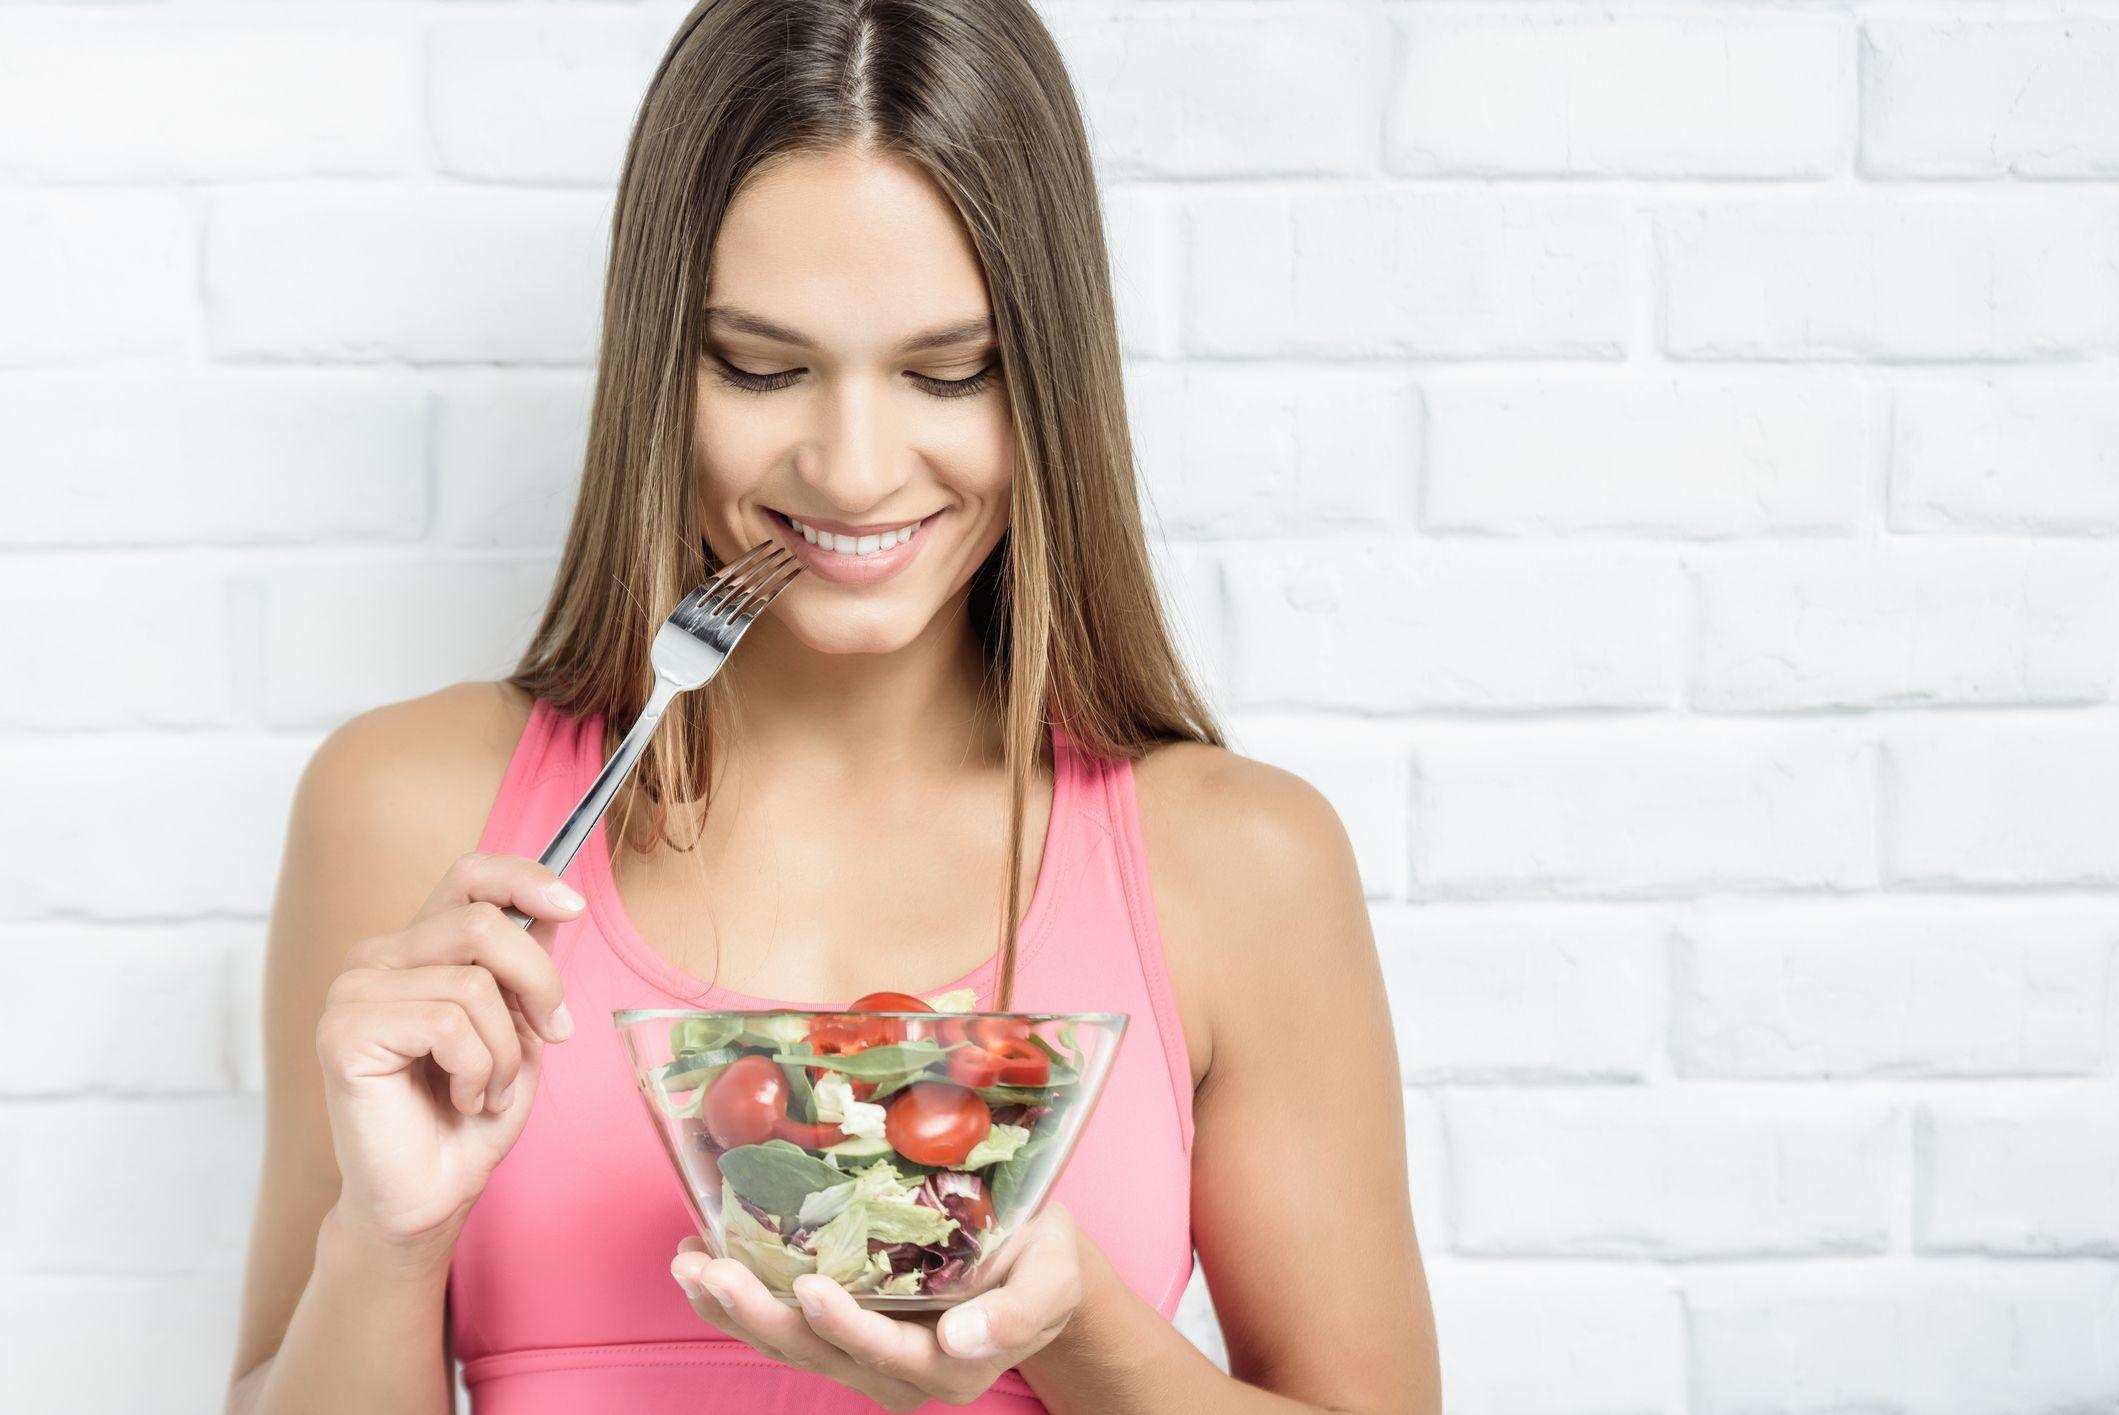 Dieta Settimanale Vegetariana : Dieta proteica vegetariana per dimagrire il menù d esempio